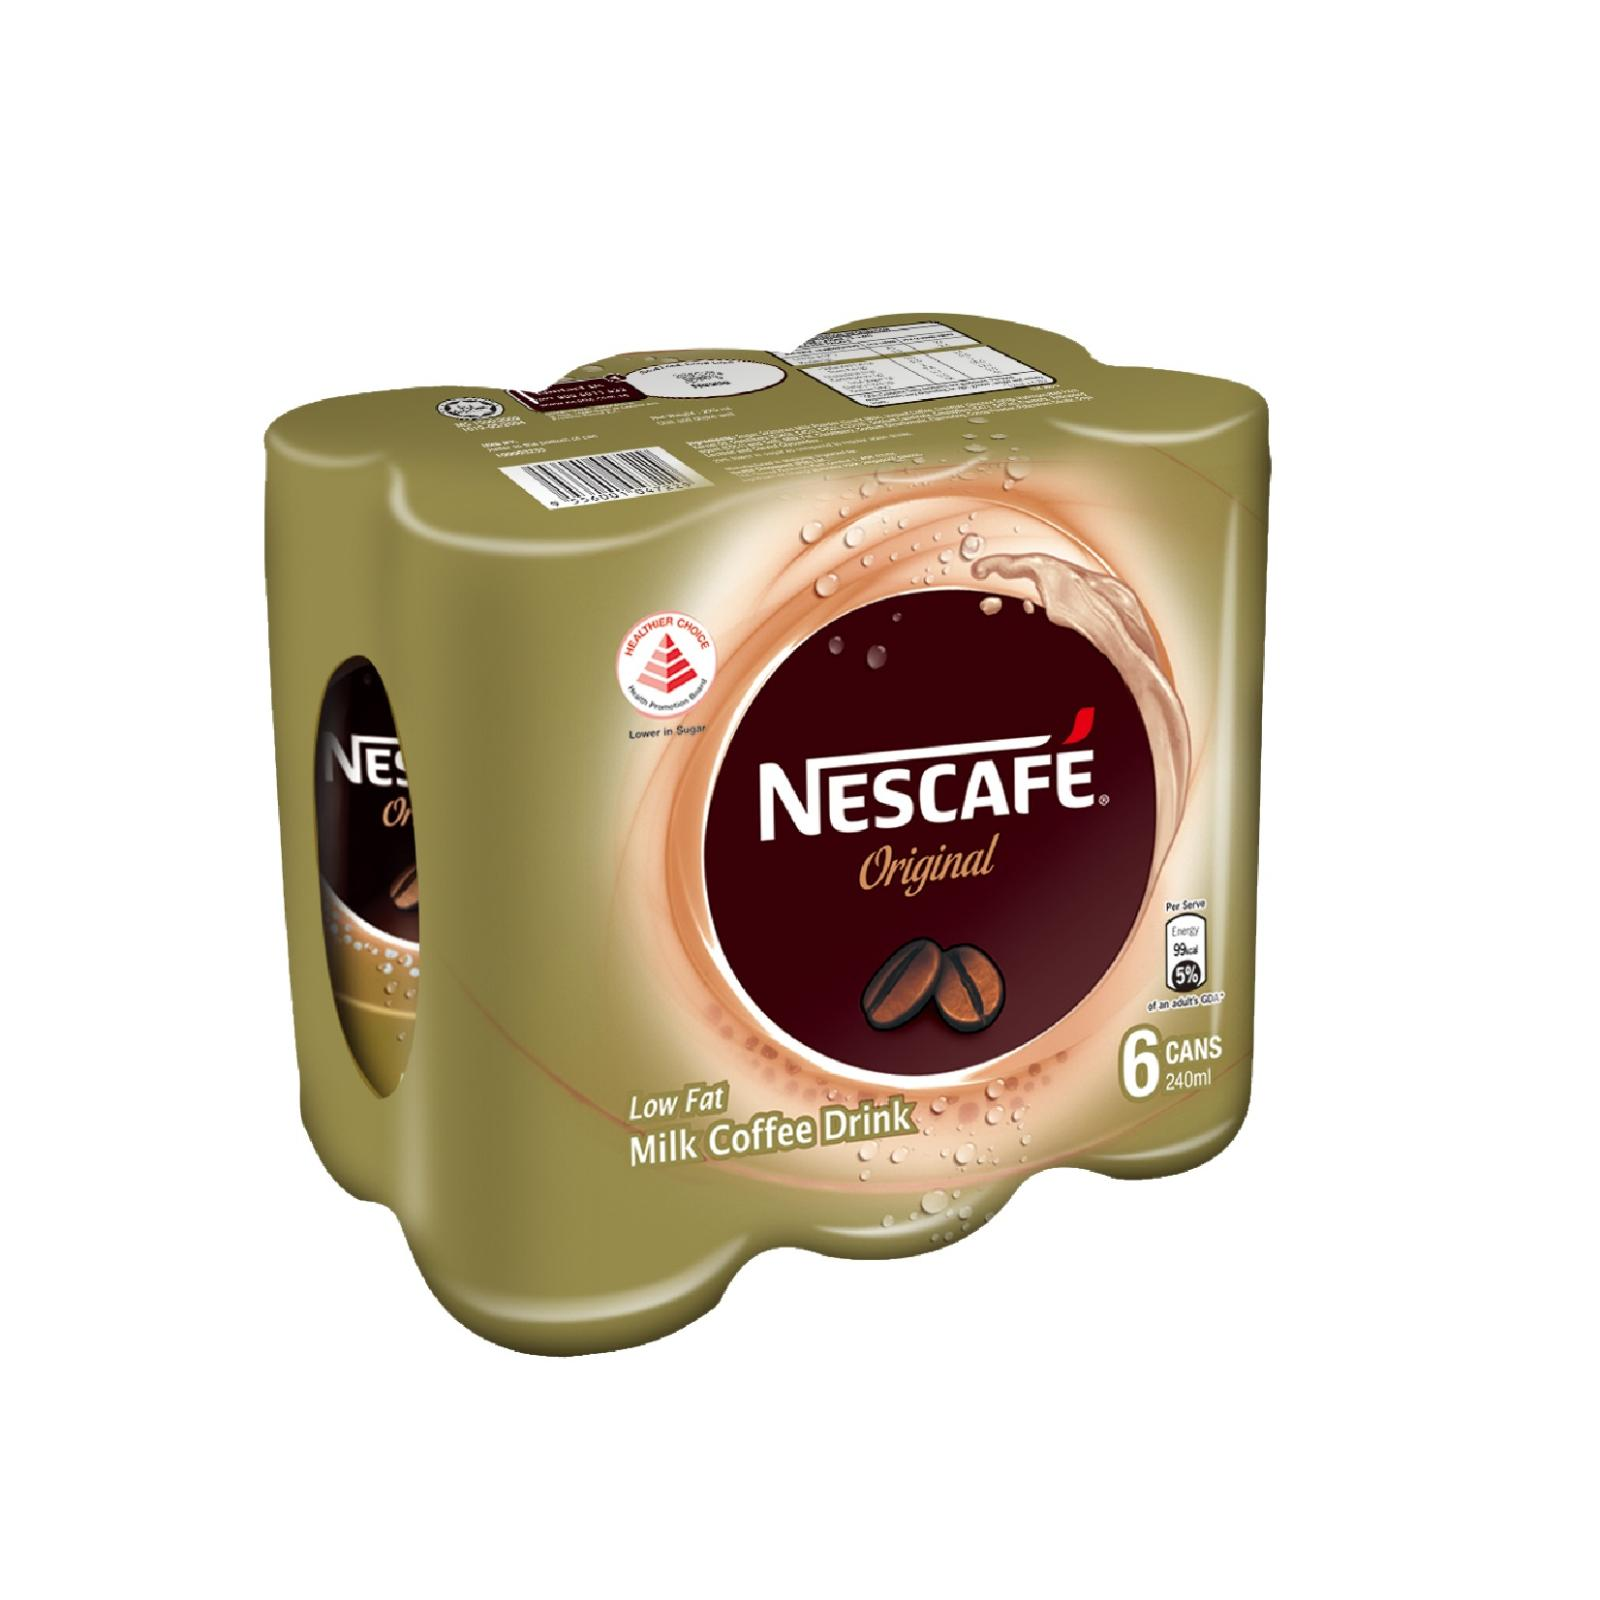 NESCAFE Milk Coffee Original Can